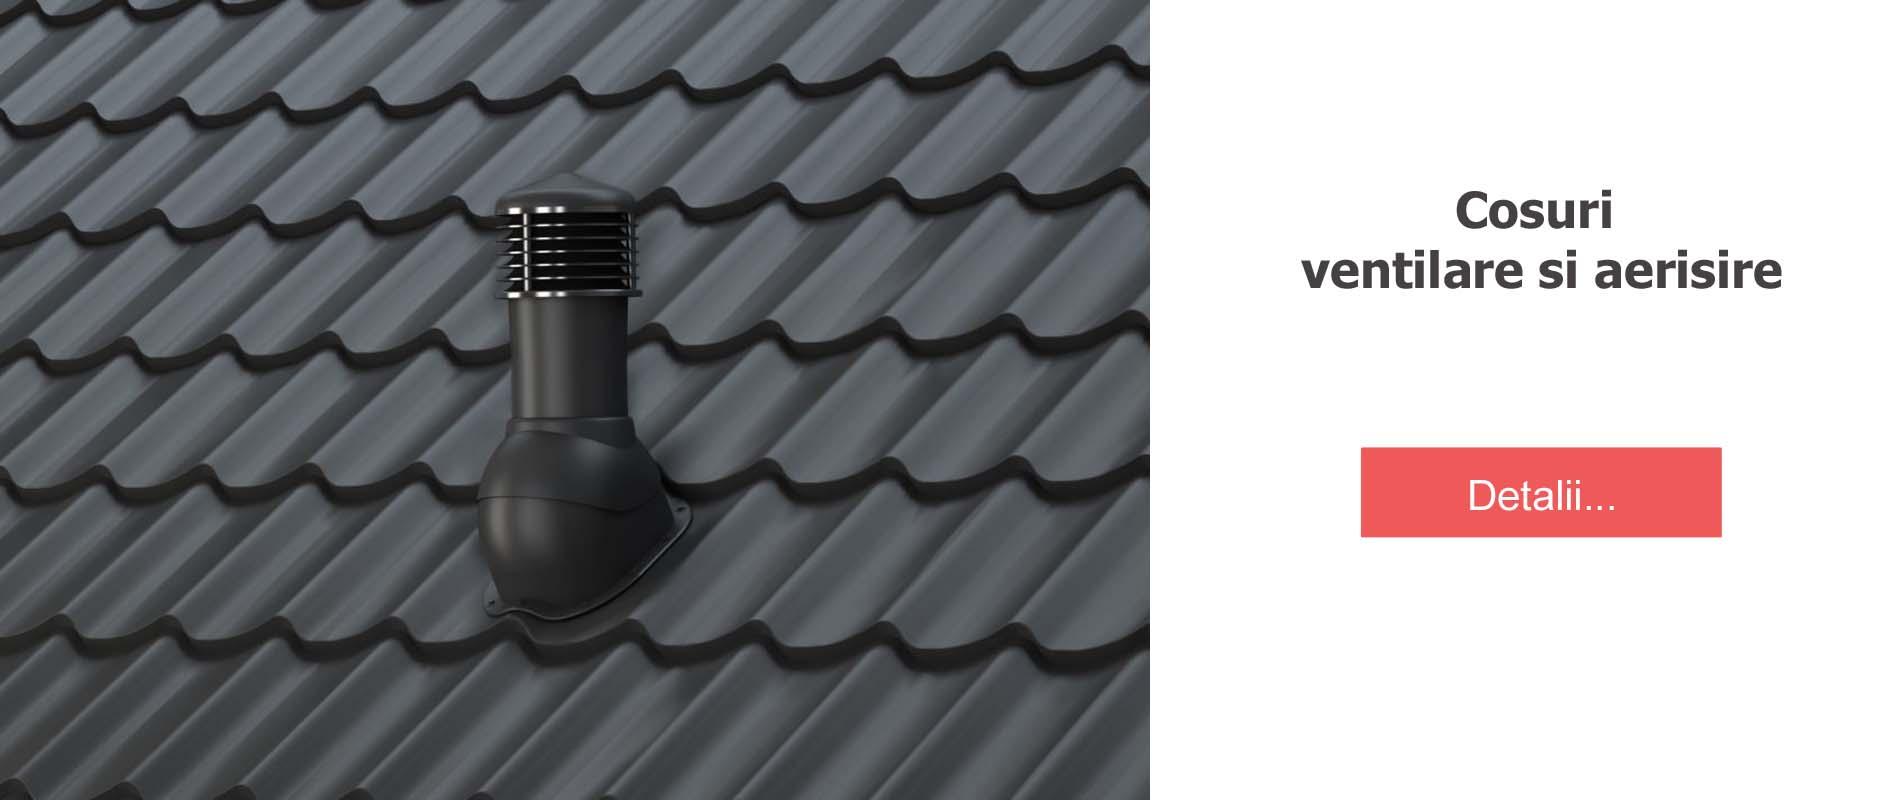 Cosuri ventilare/aerisire